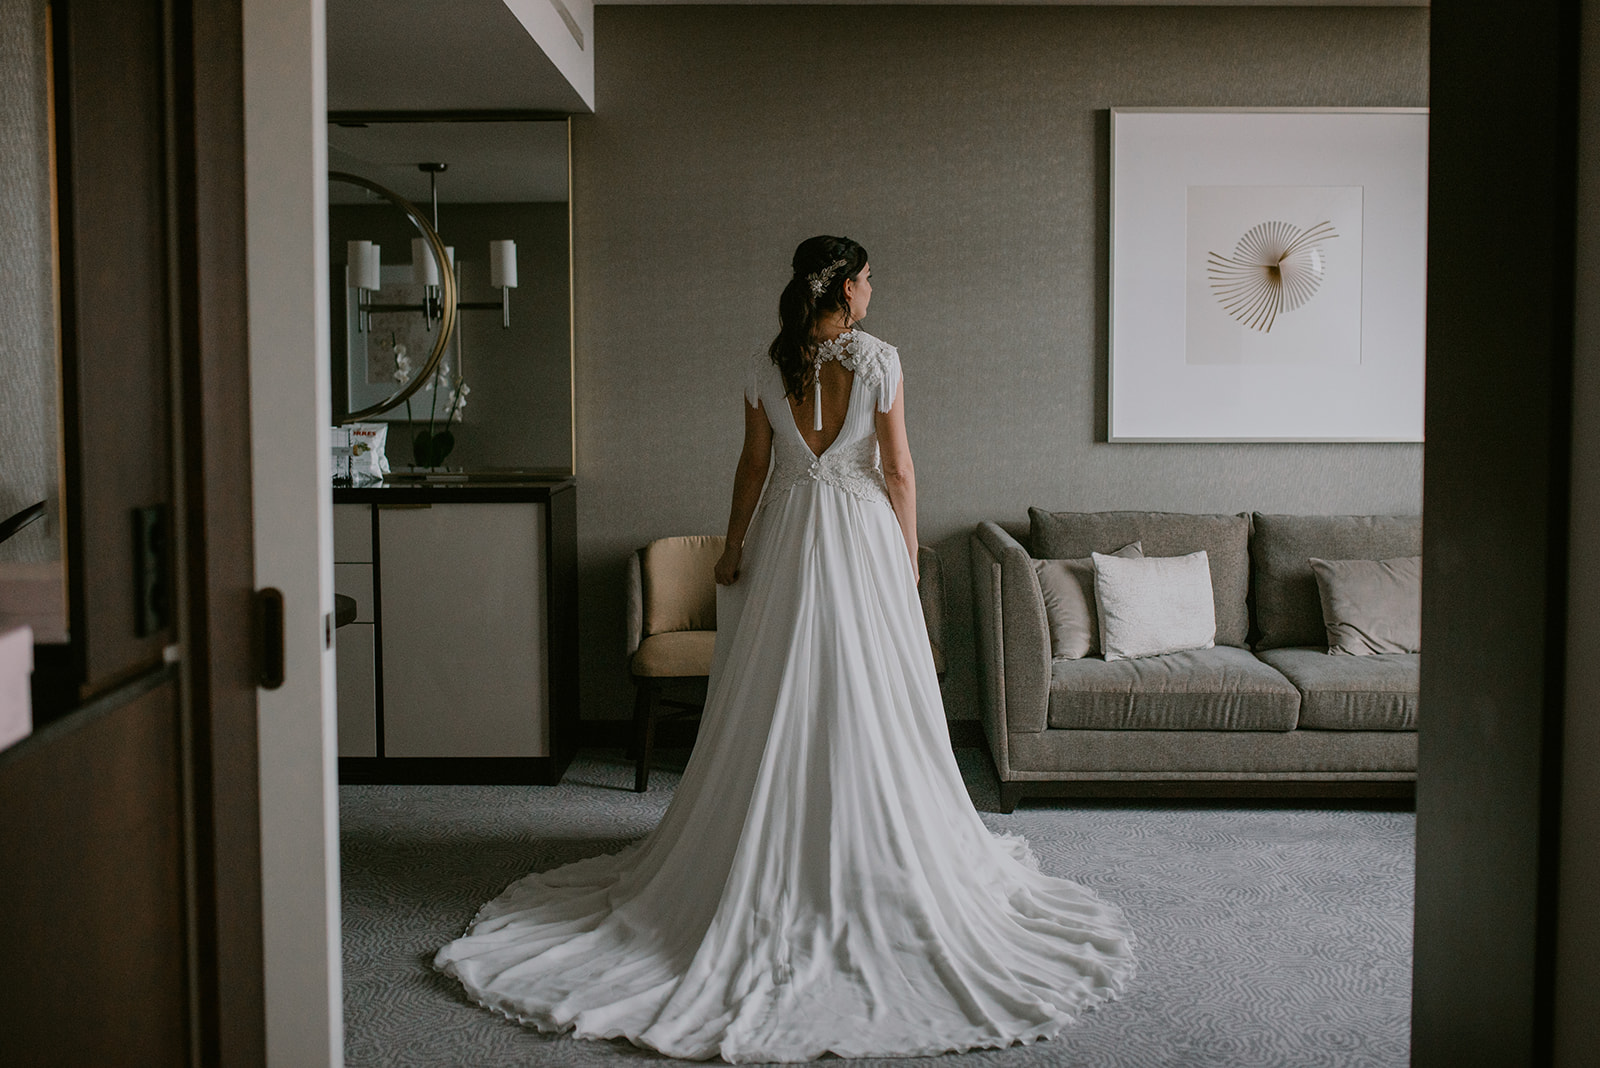 Una semana antes de la boda